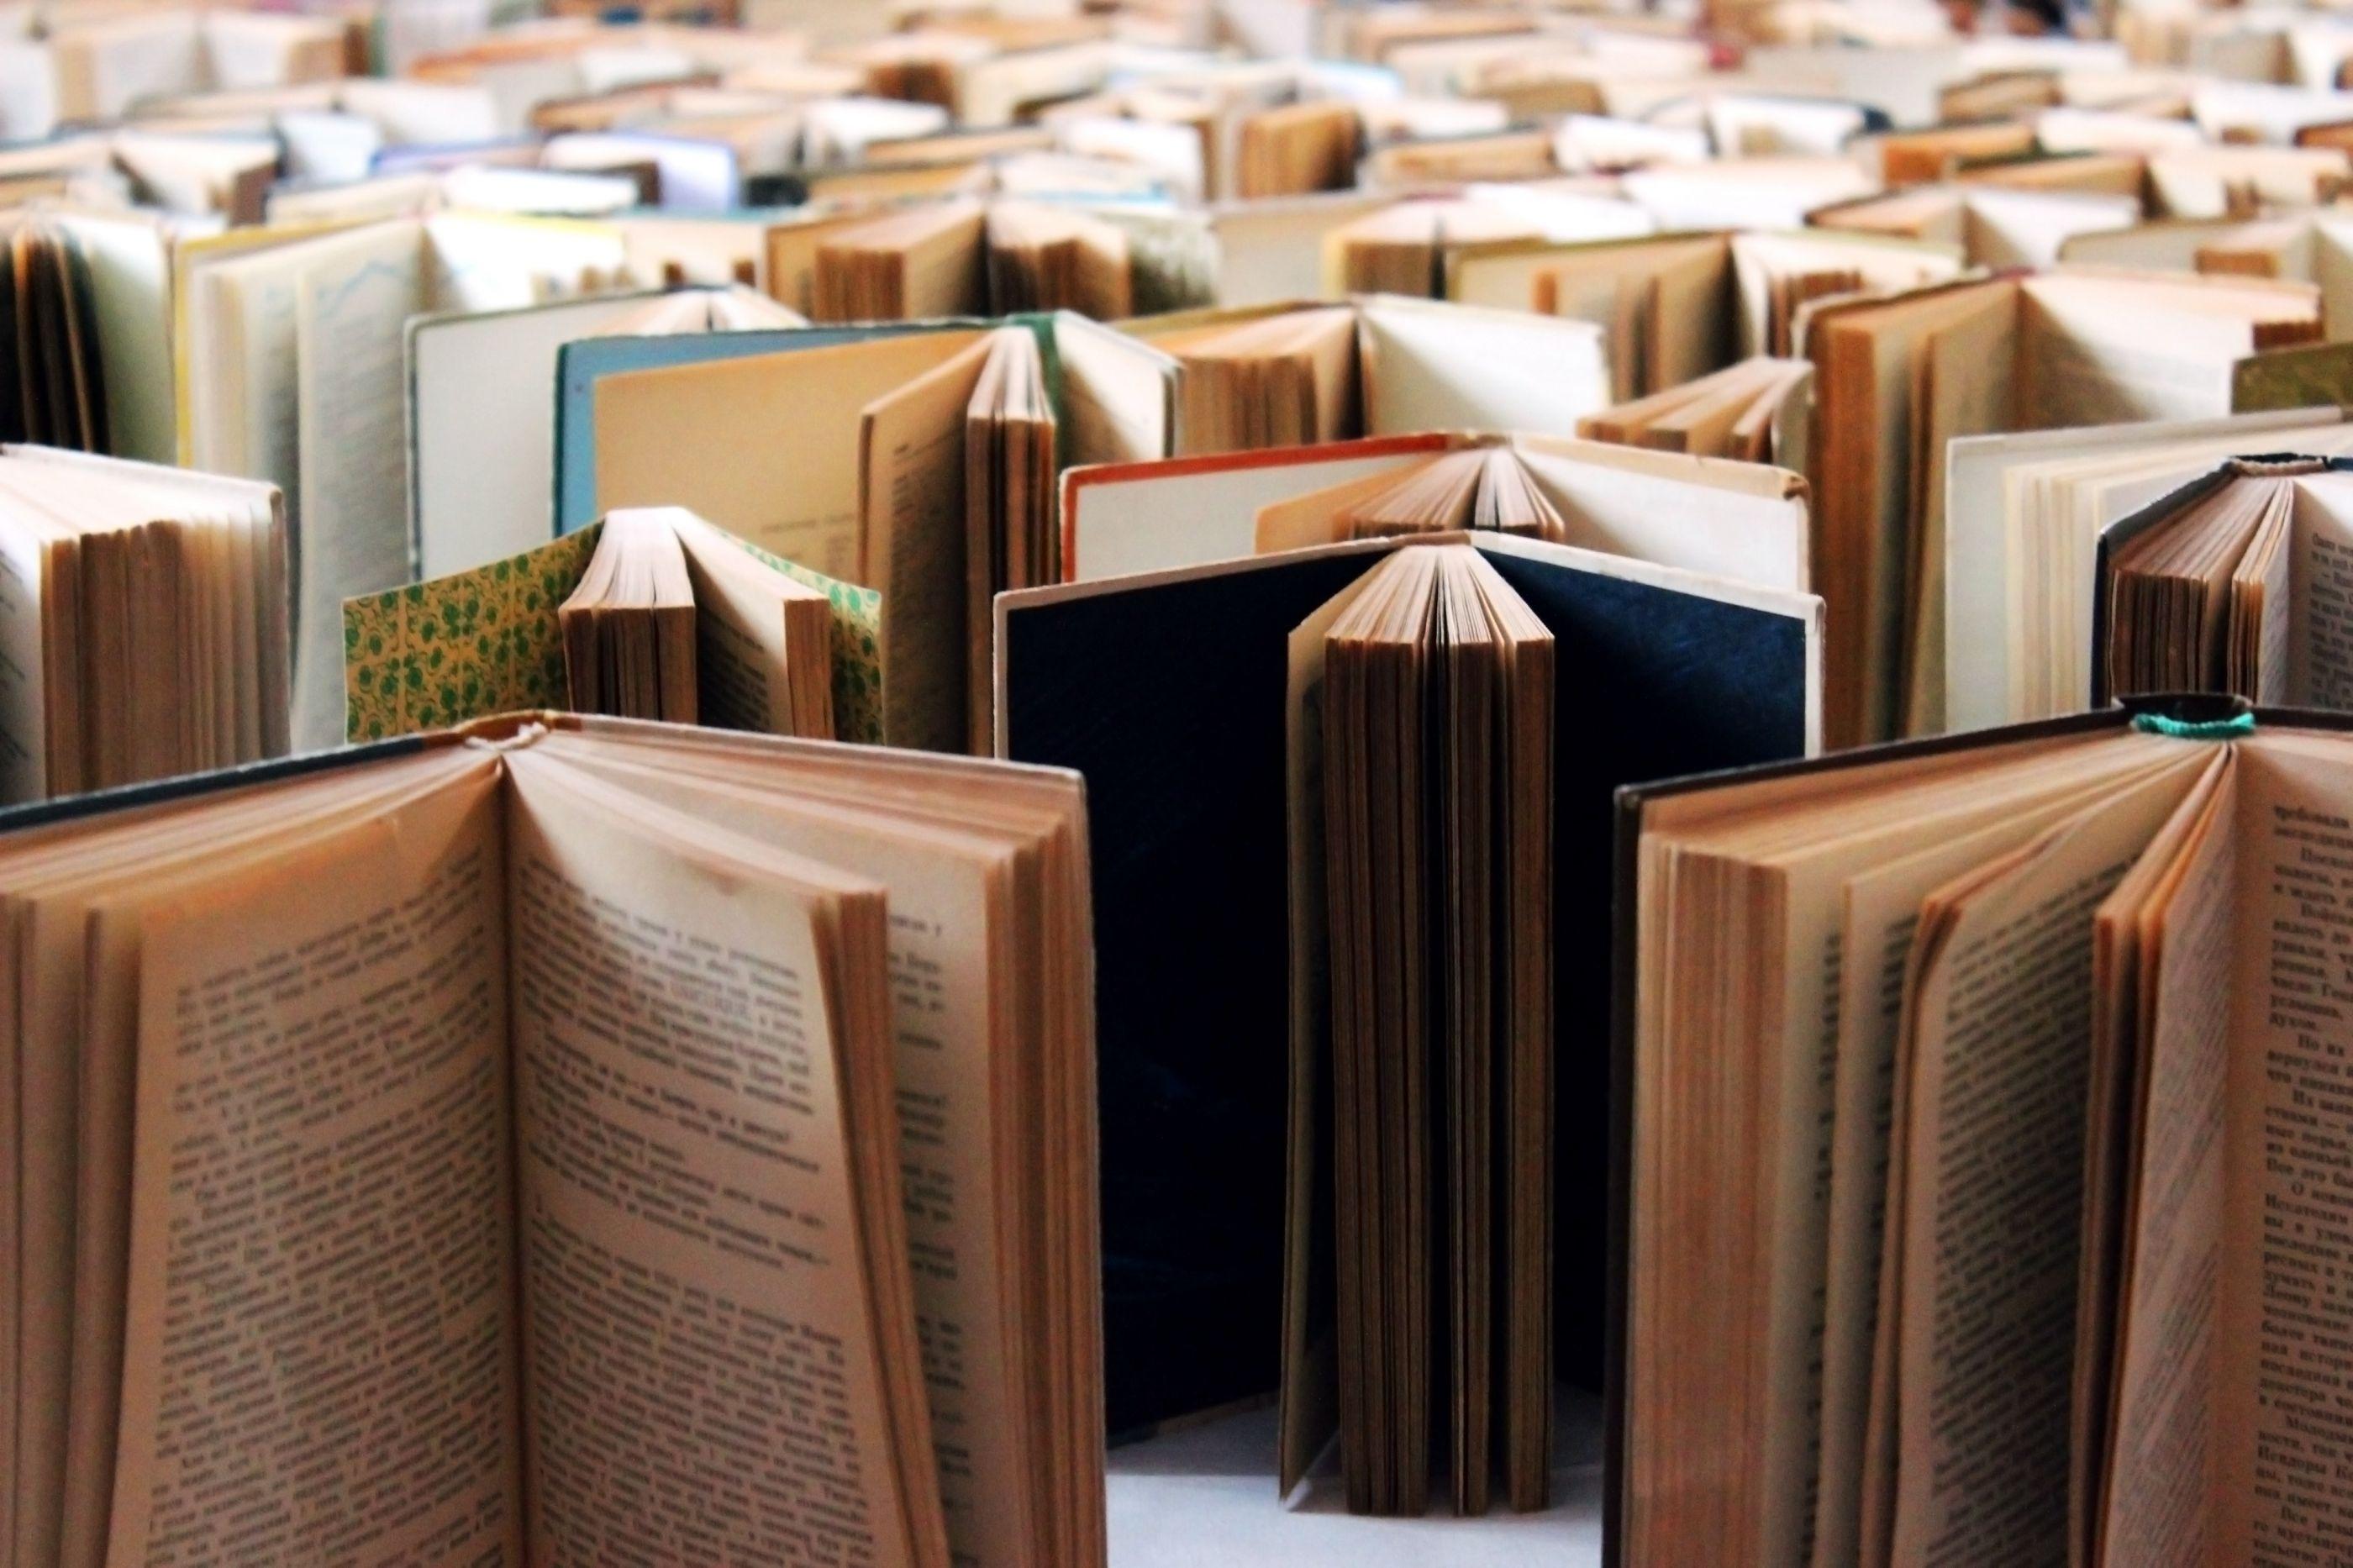 Instituto Camões lança prémio para distinguir literatura angolana